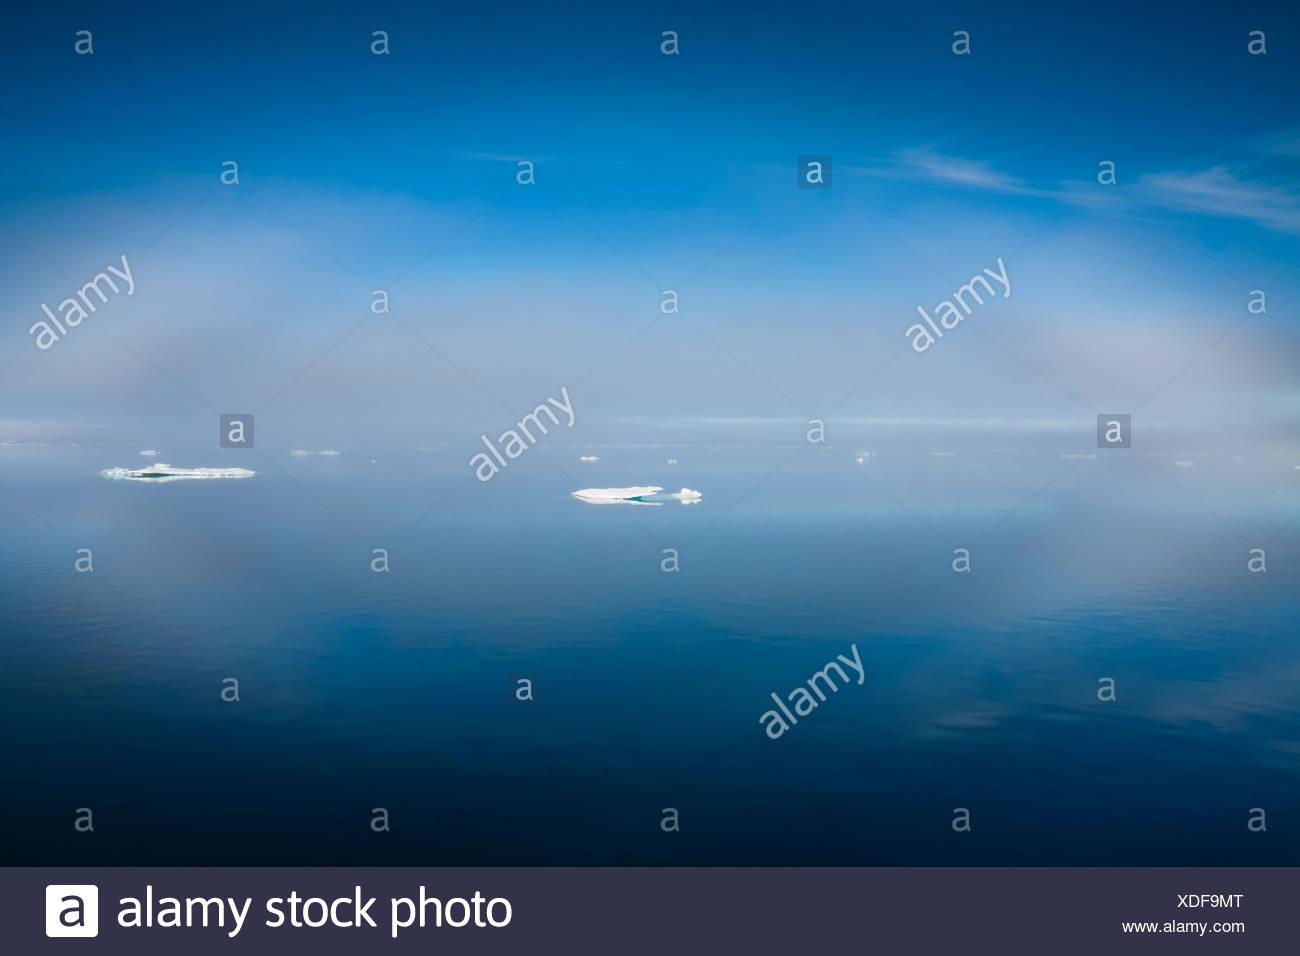 Ice in Barrow Strait, Qikiqtaaluk Region, Nunavut, Canada. - Stock Image